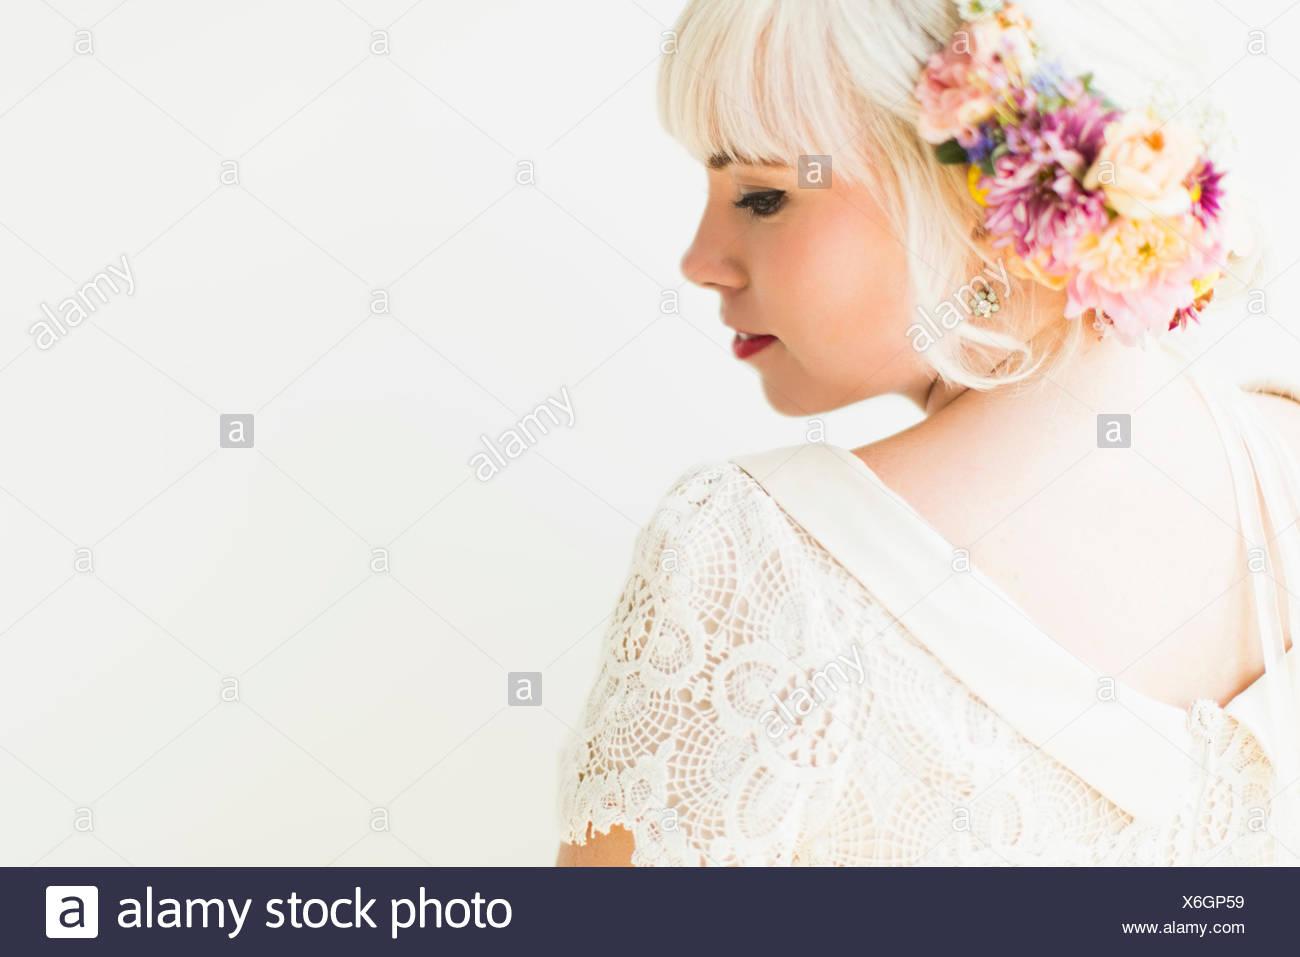 Portrait of bride - Stock Image